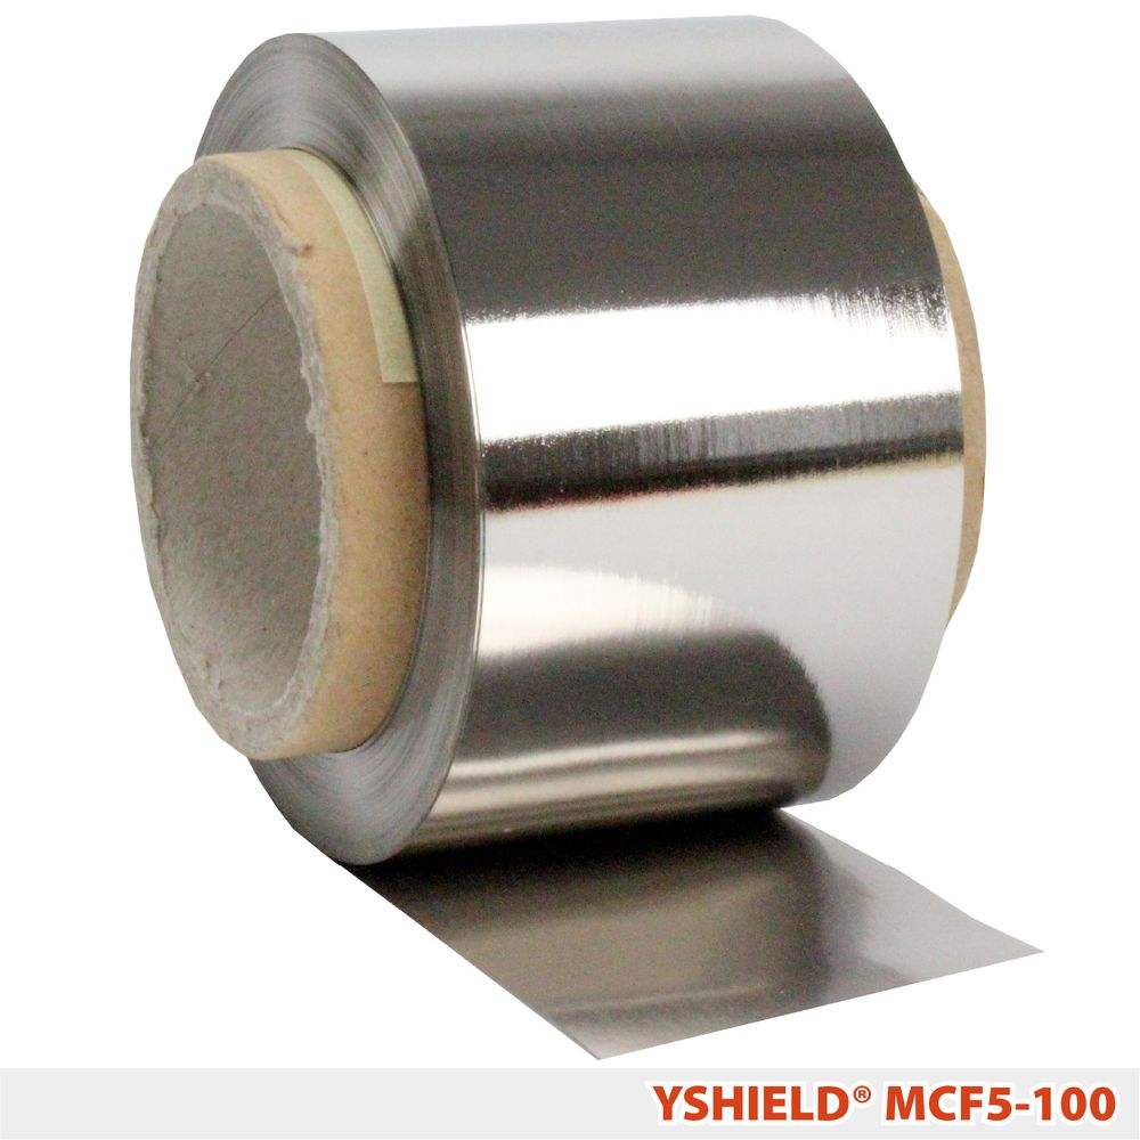 YSHIELD® MCF5   Magnetfeld-Abschirmfolie   Breite 5 cm   100 Meter